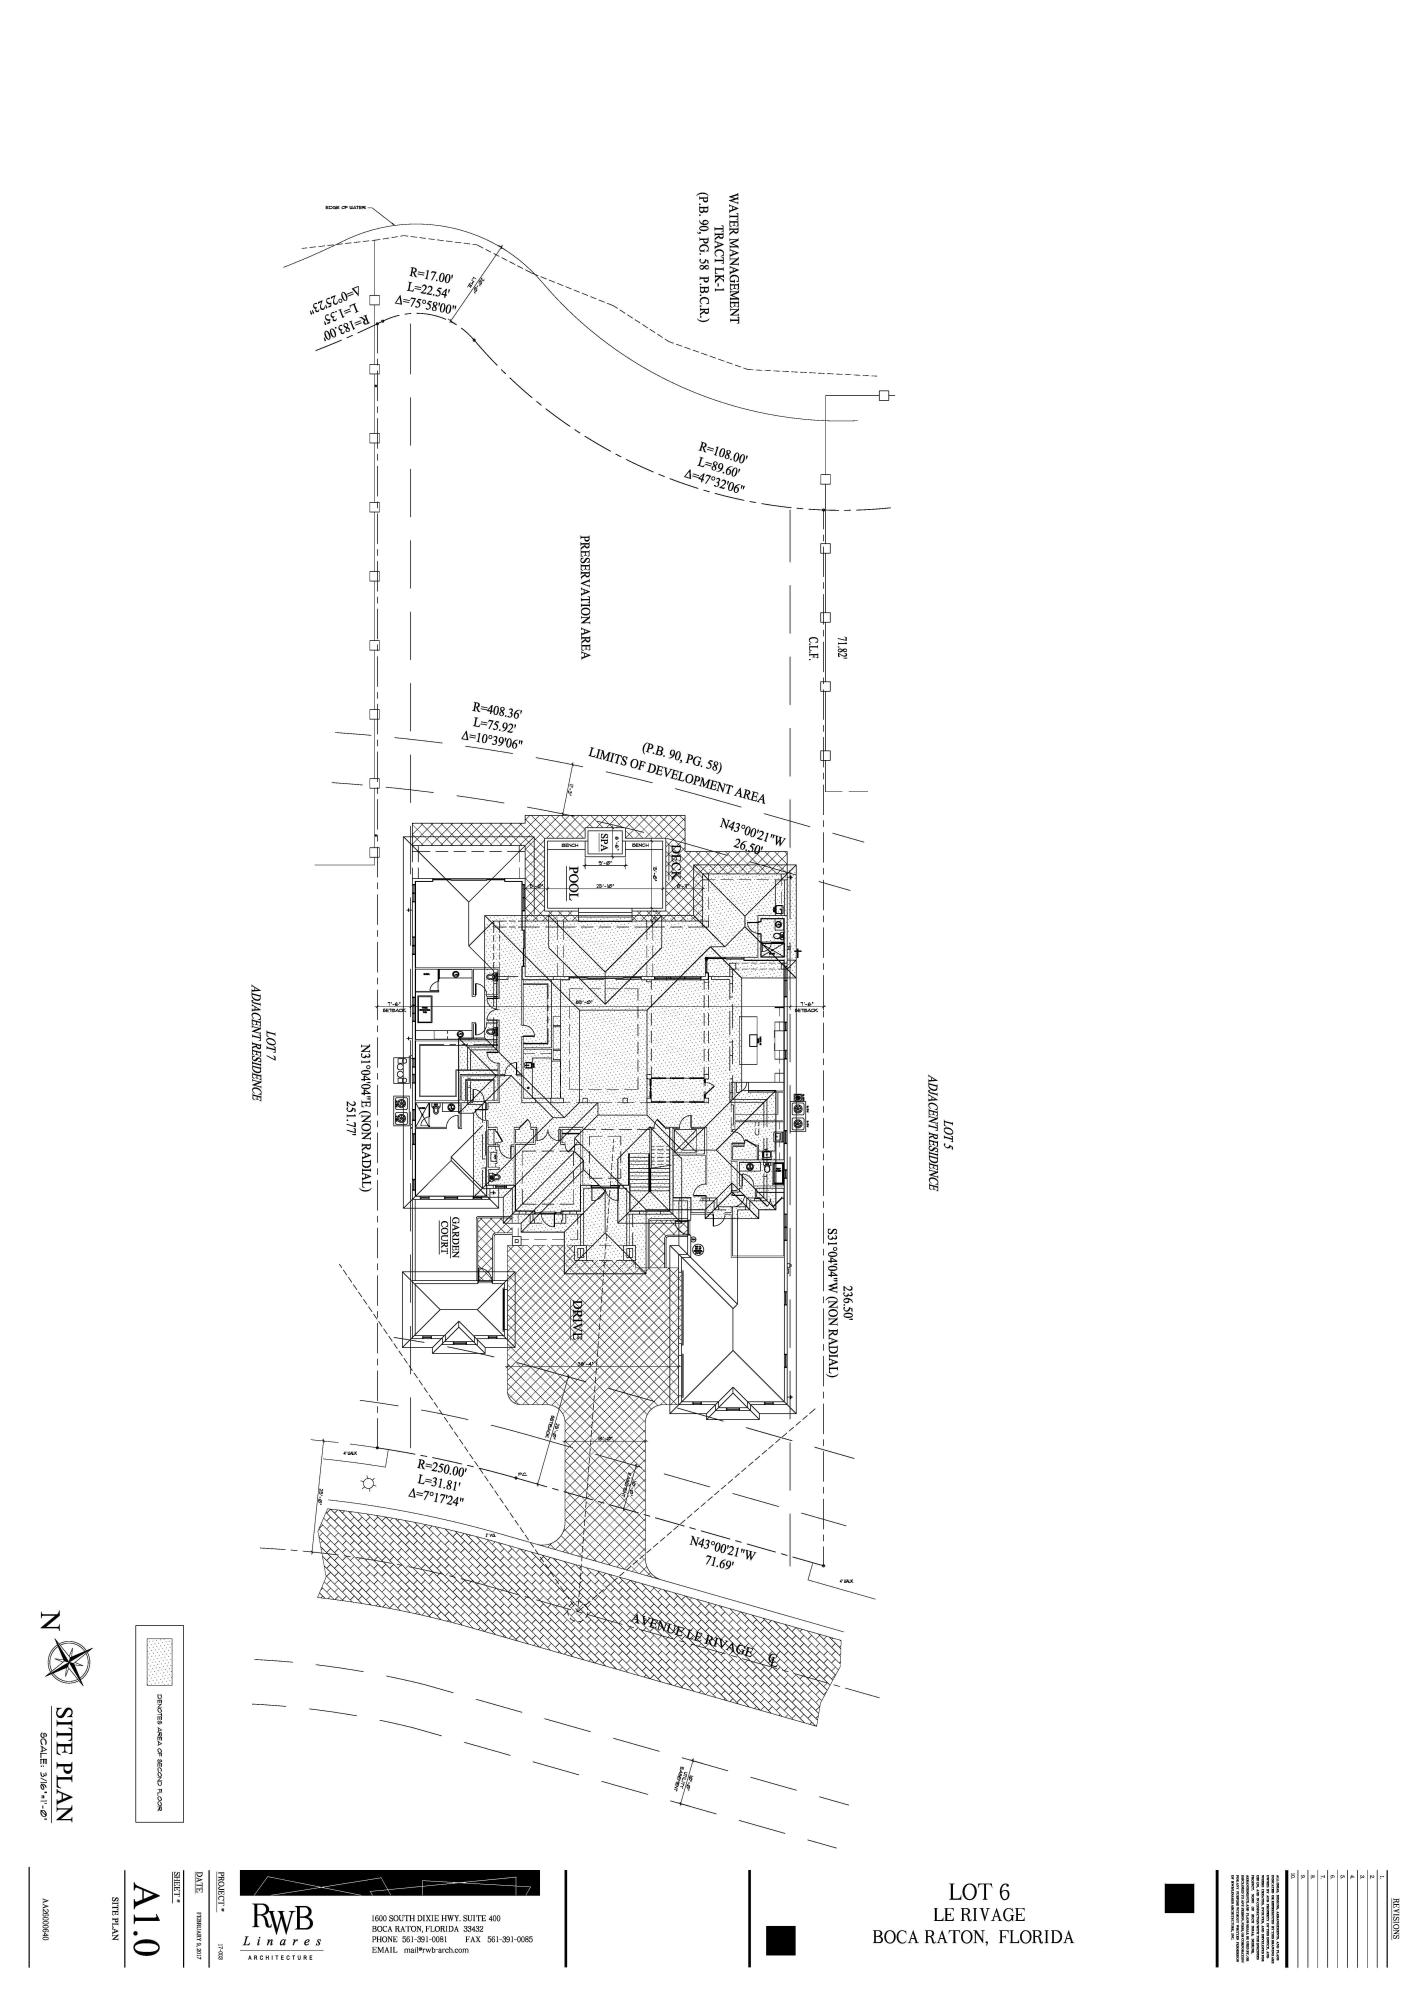 LOT 6 LE RIVAGE - A1.0 Site Plan